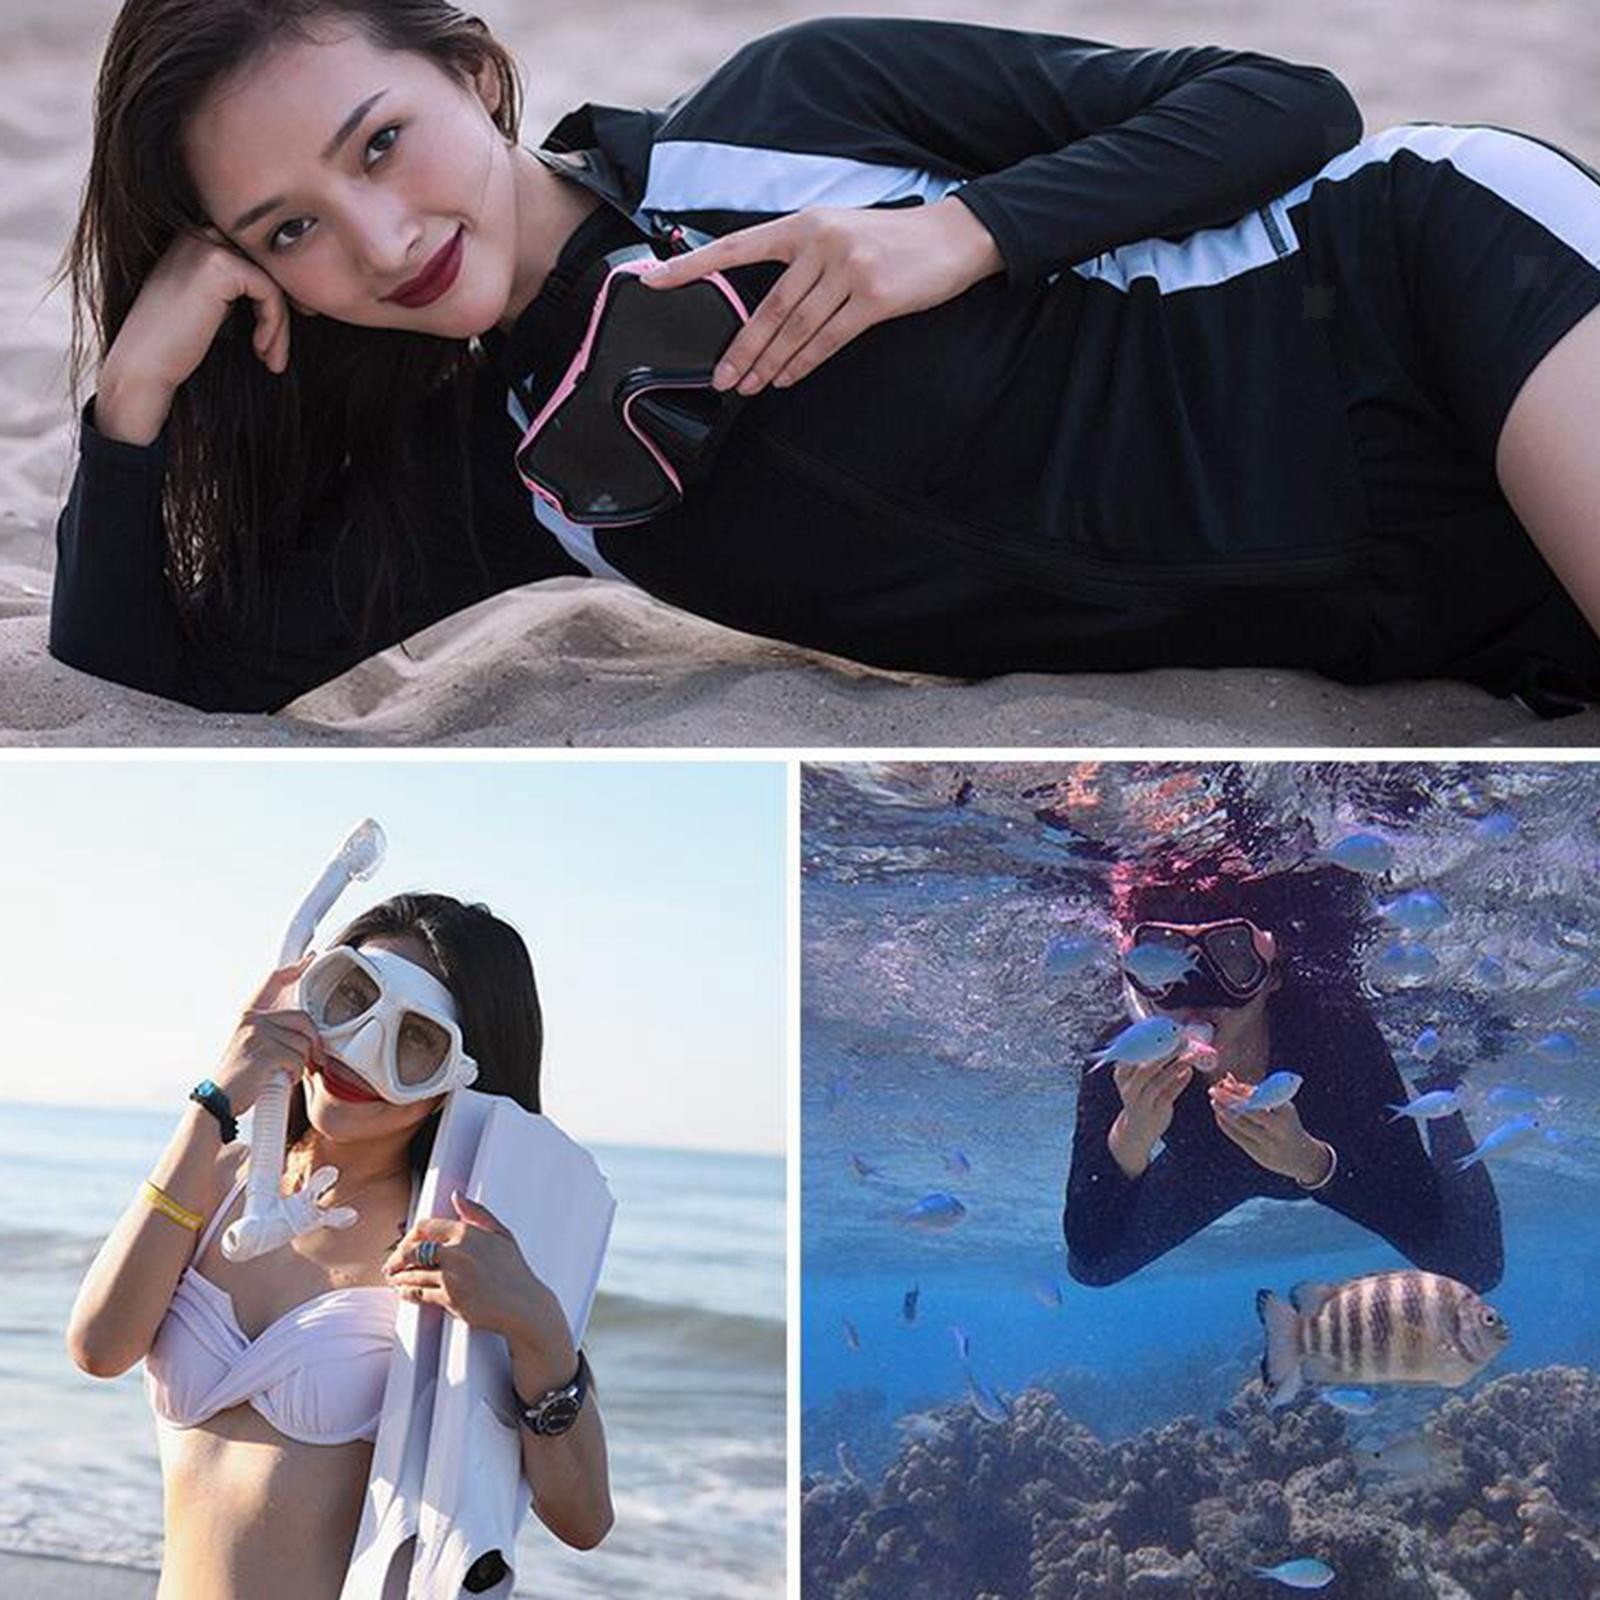 Indexbild 18 - Premium Wet Snorkel Women Men Adults Snorkels Breathing Tube Breath Tube